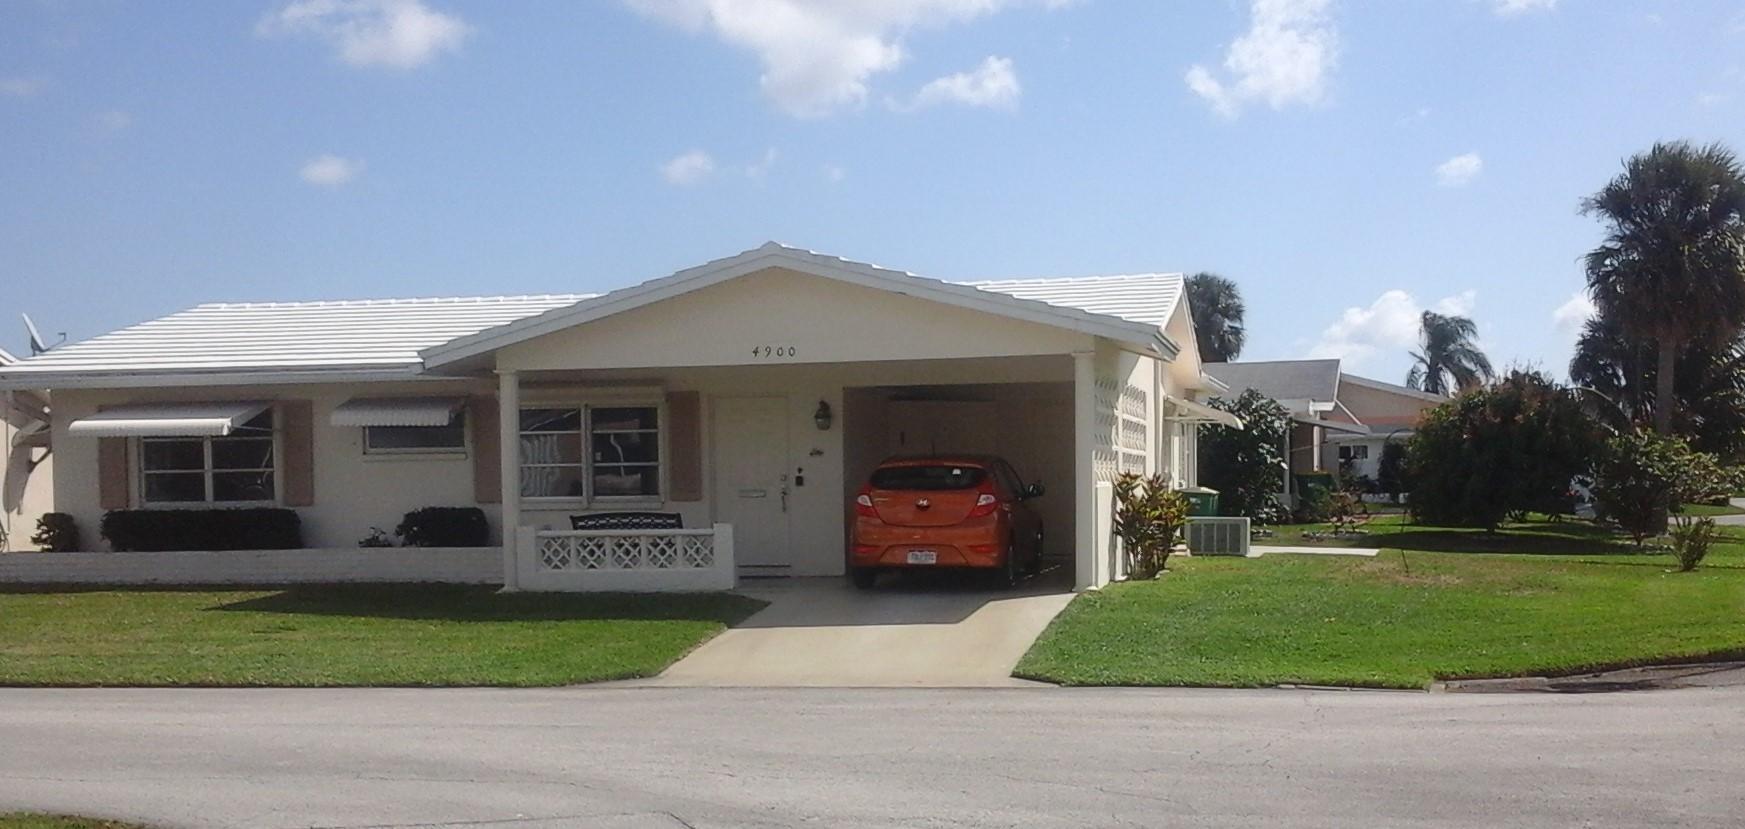 4900 Nw 42 Terrace, Tamarac, FL 33319